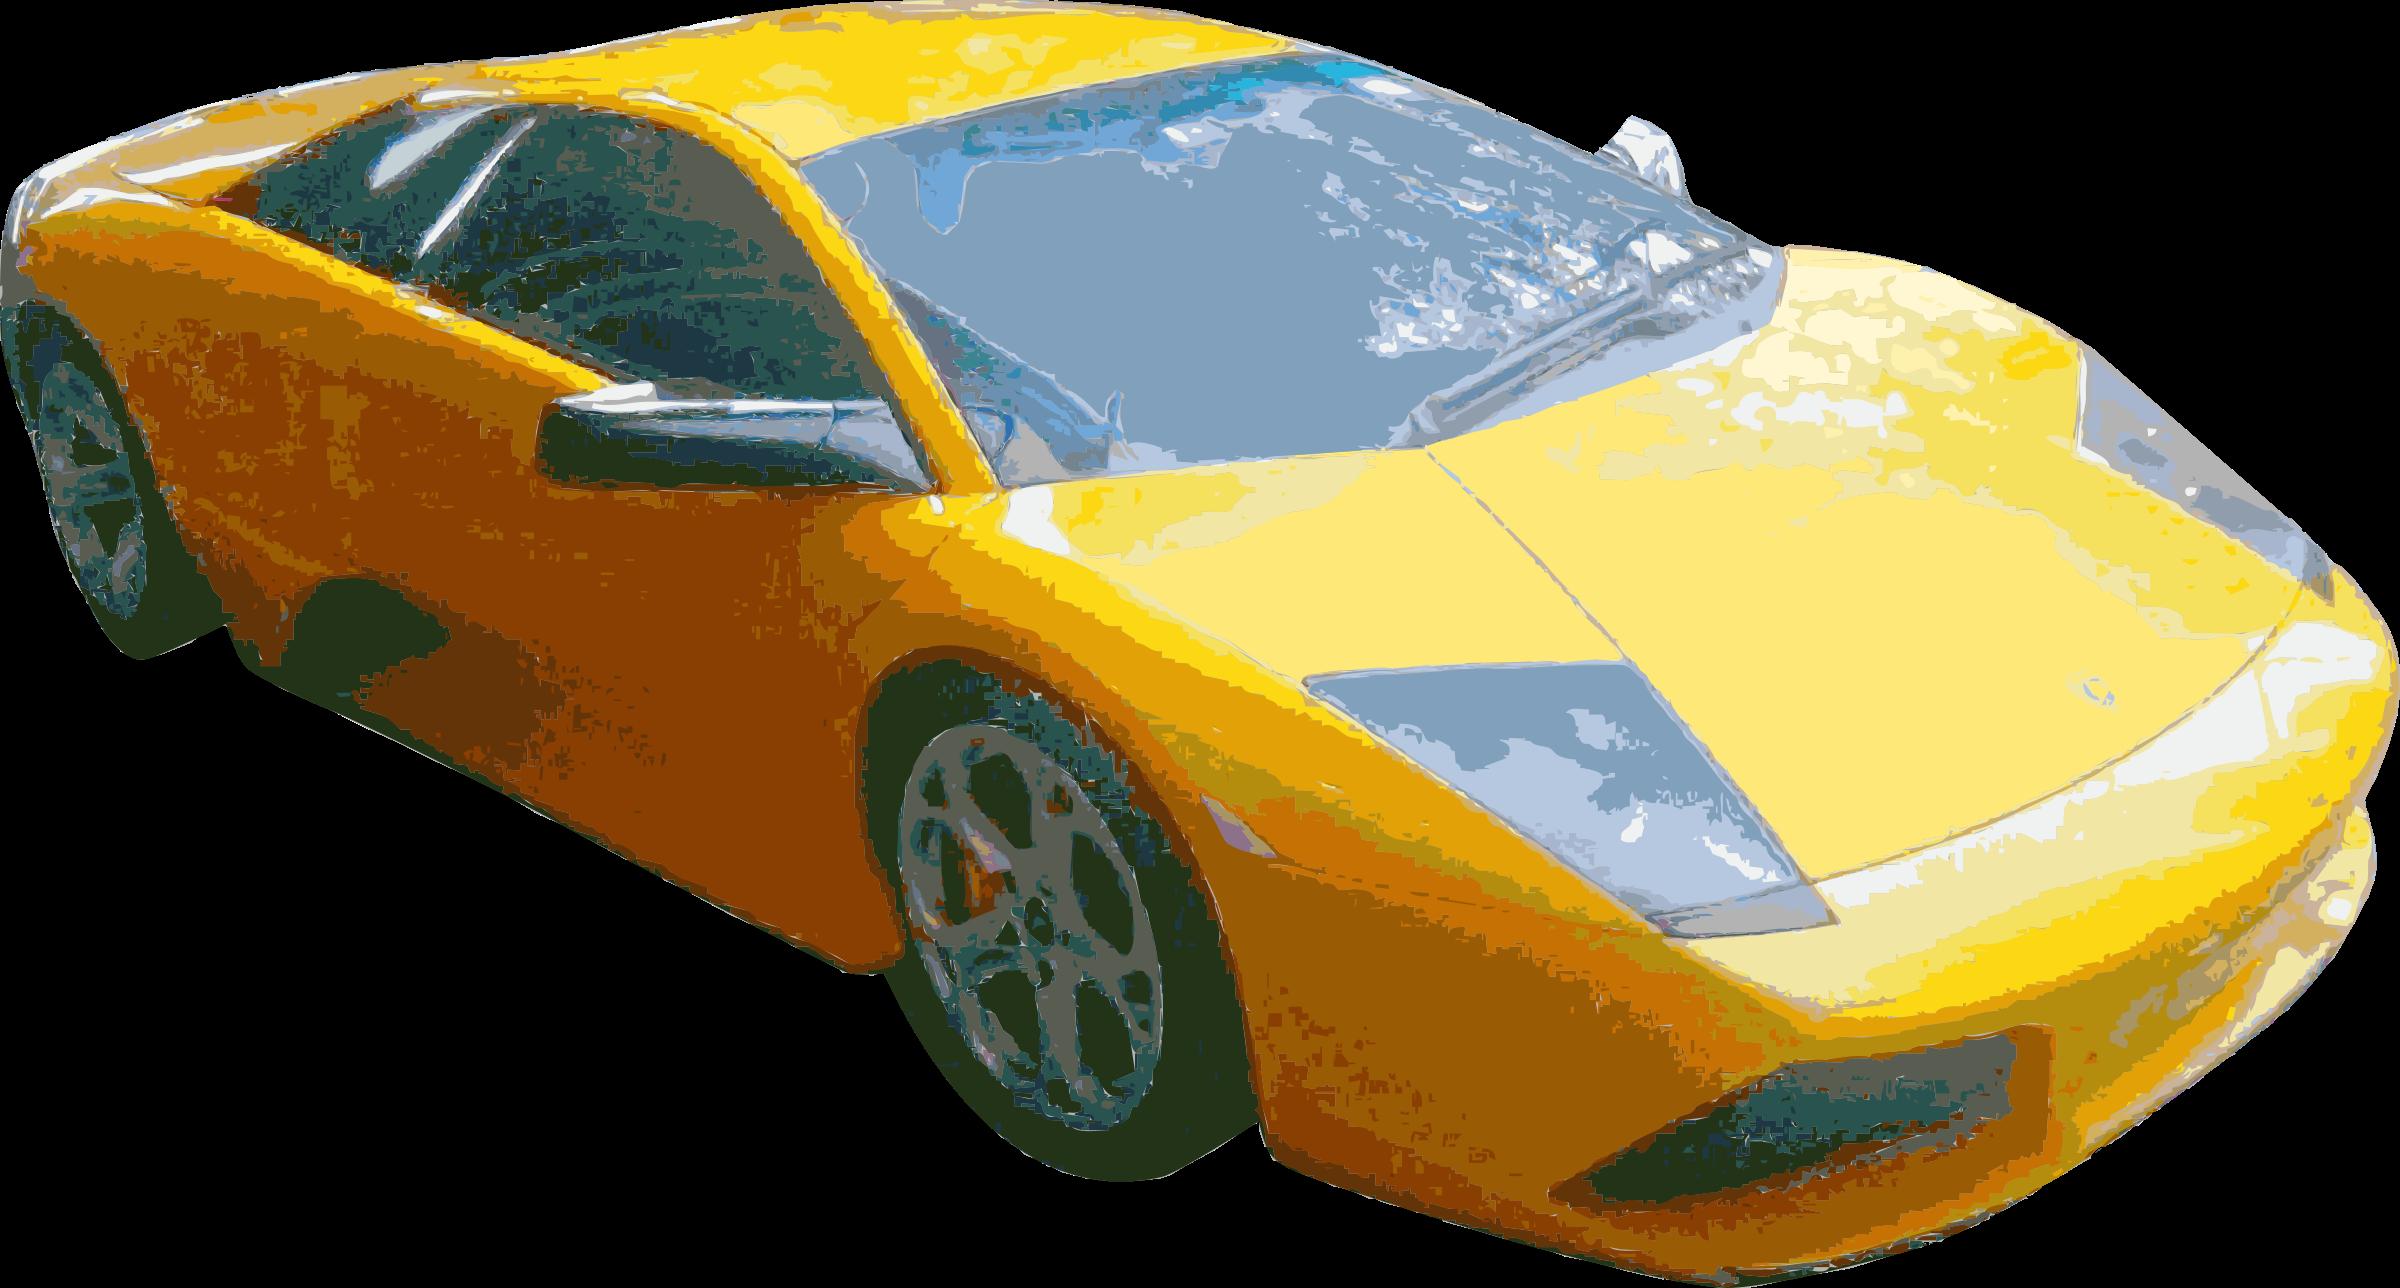 Clipart - Sports Car Cutout remix jpg transparent stock